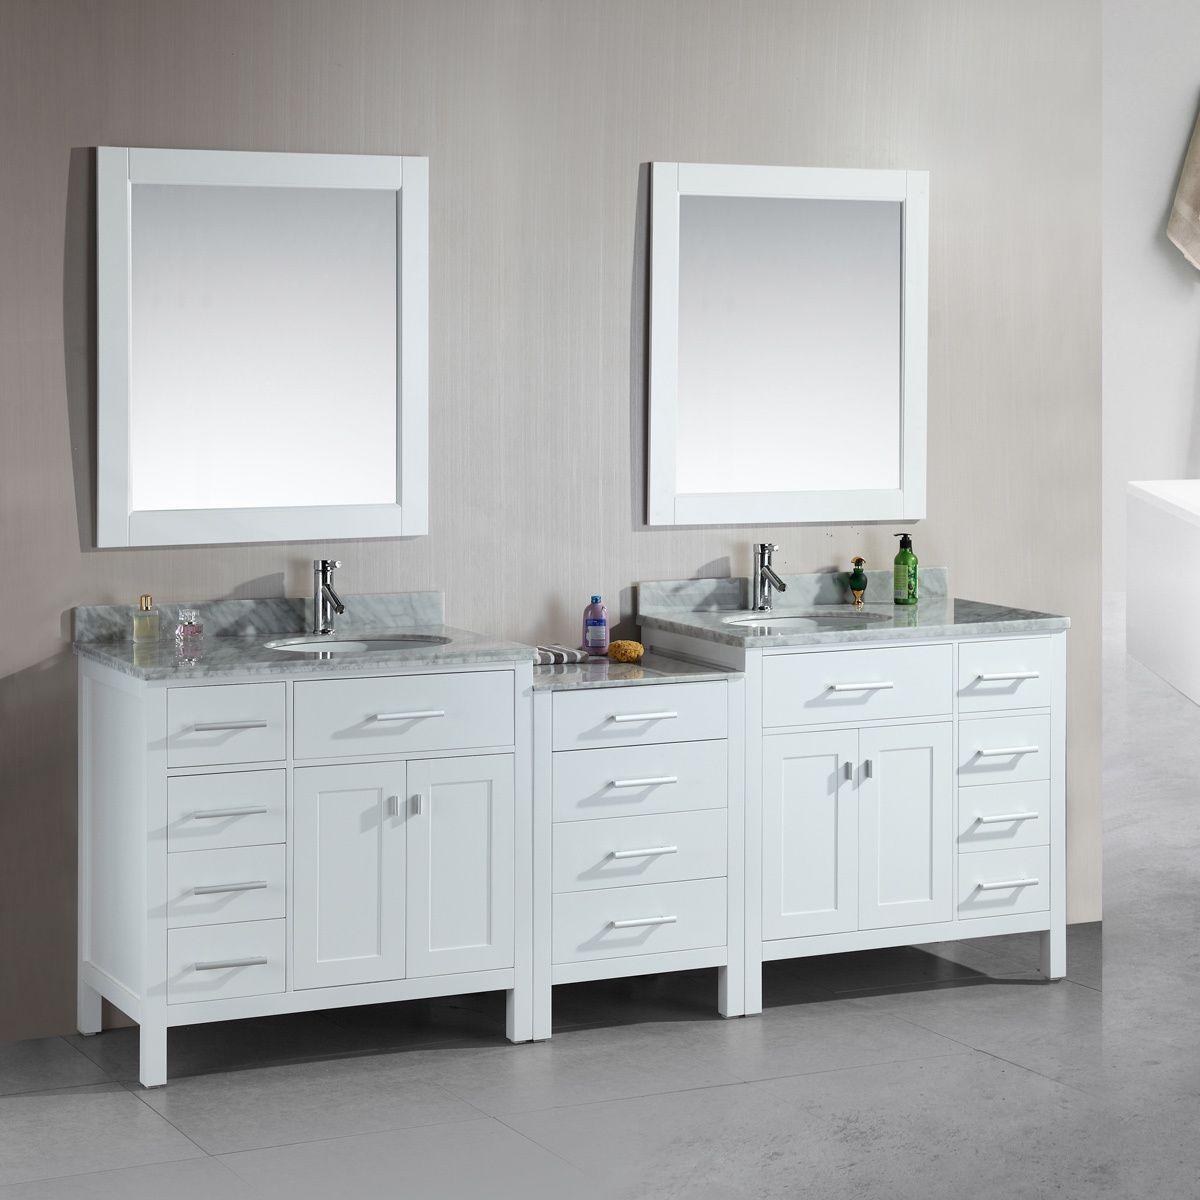 Design A Bathroom Vanity Online Custom This Elegant Double Sink Bathroom Vanity Features Beautiful Solid Design Ideas